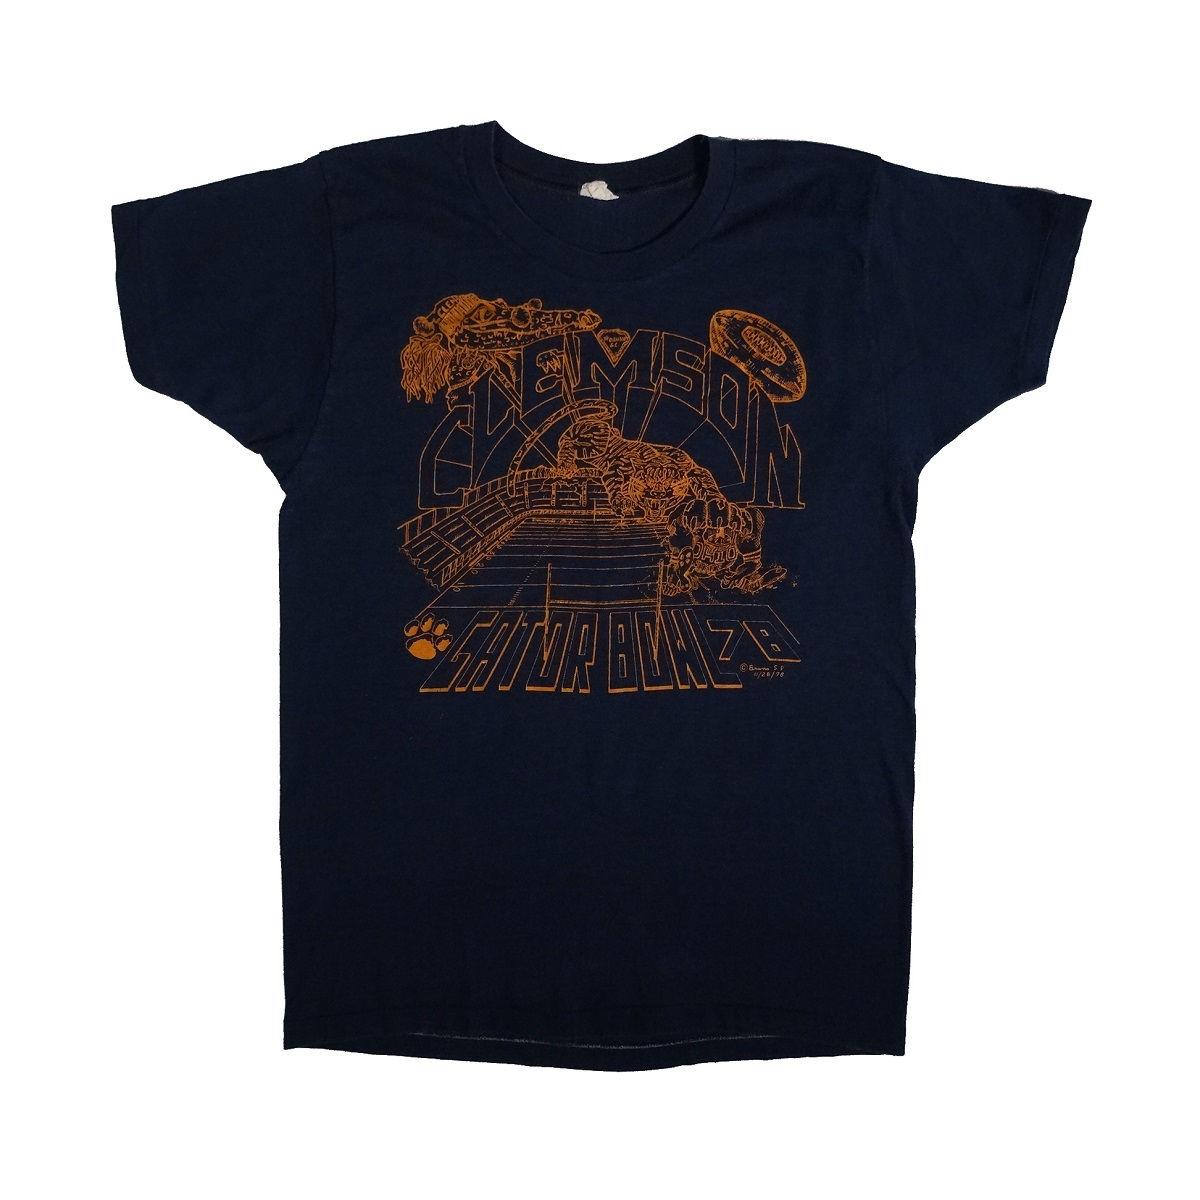 Clemson Tigers Football Gator Bowl 1978 Vintage T Shirt Front